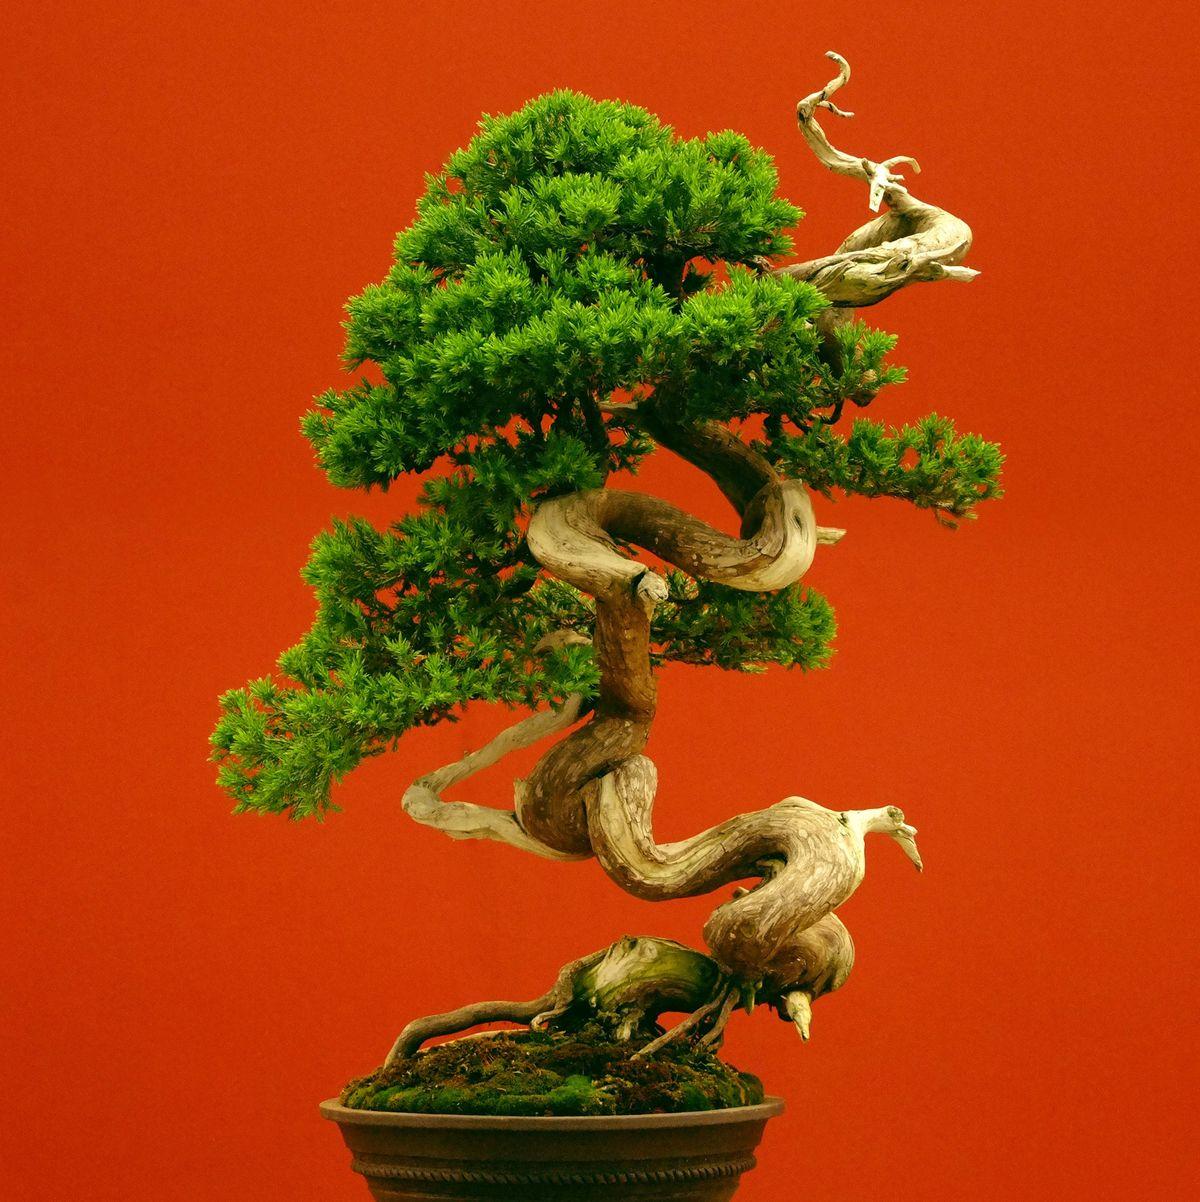 Japanese Couple Begs Thief To Return Their Bonsai Trees